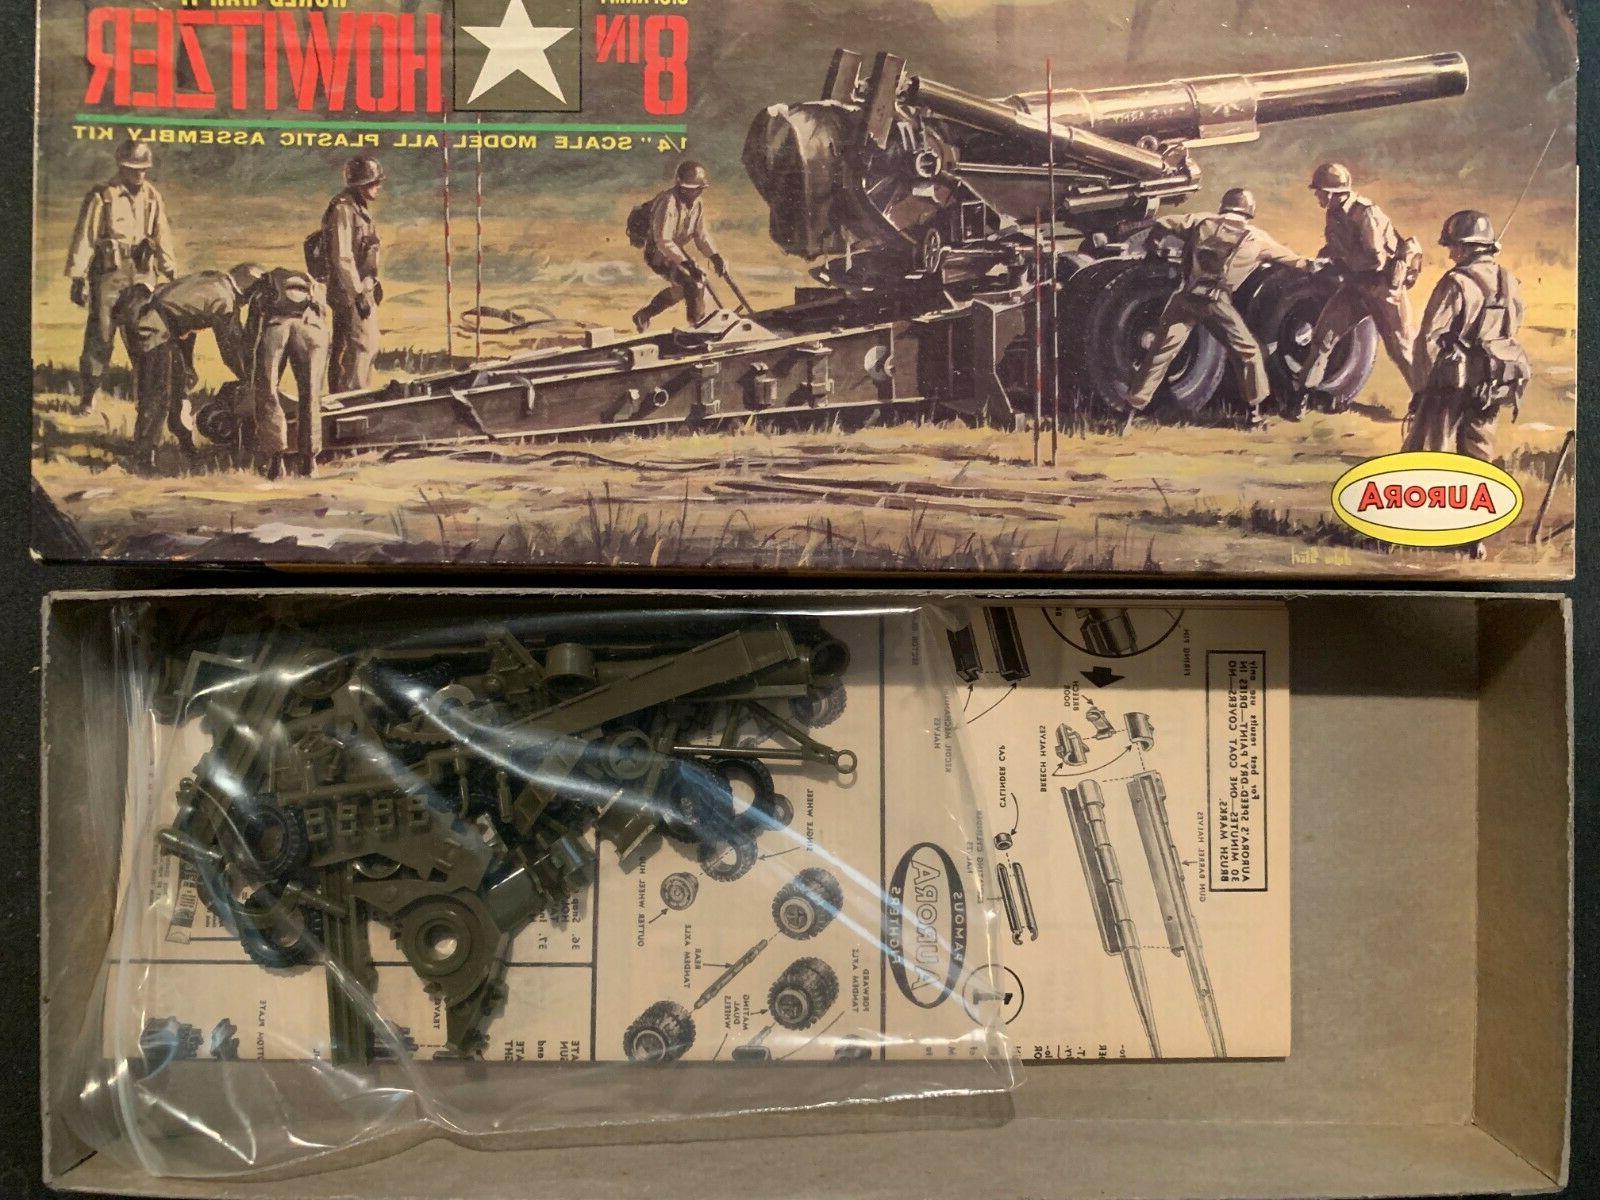 Aurora Model Kit - U.S. Army Howitzer Rare